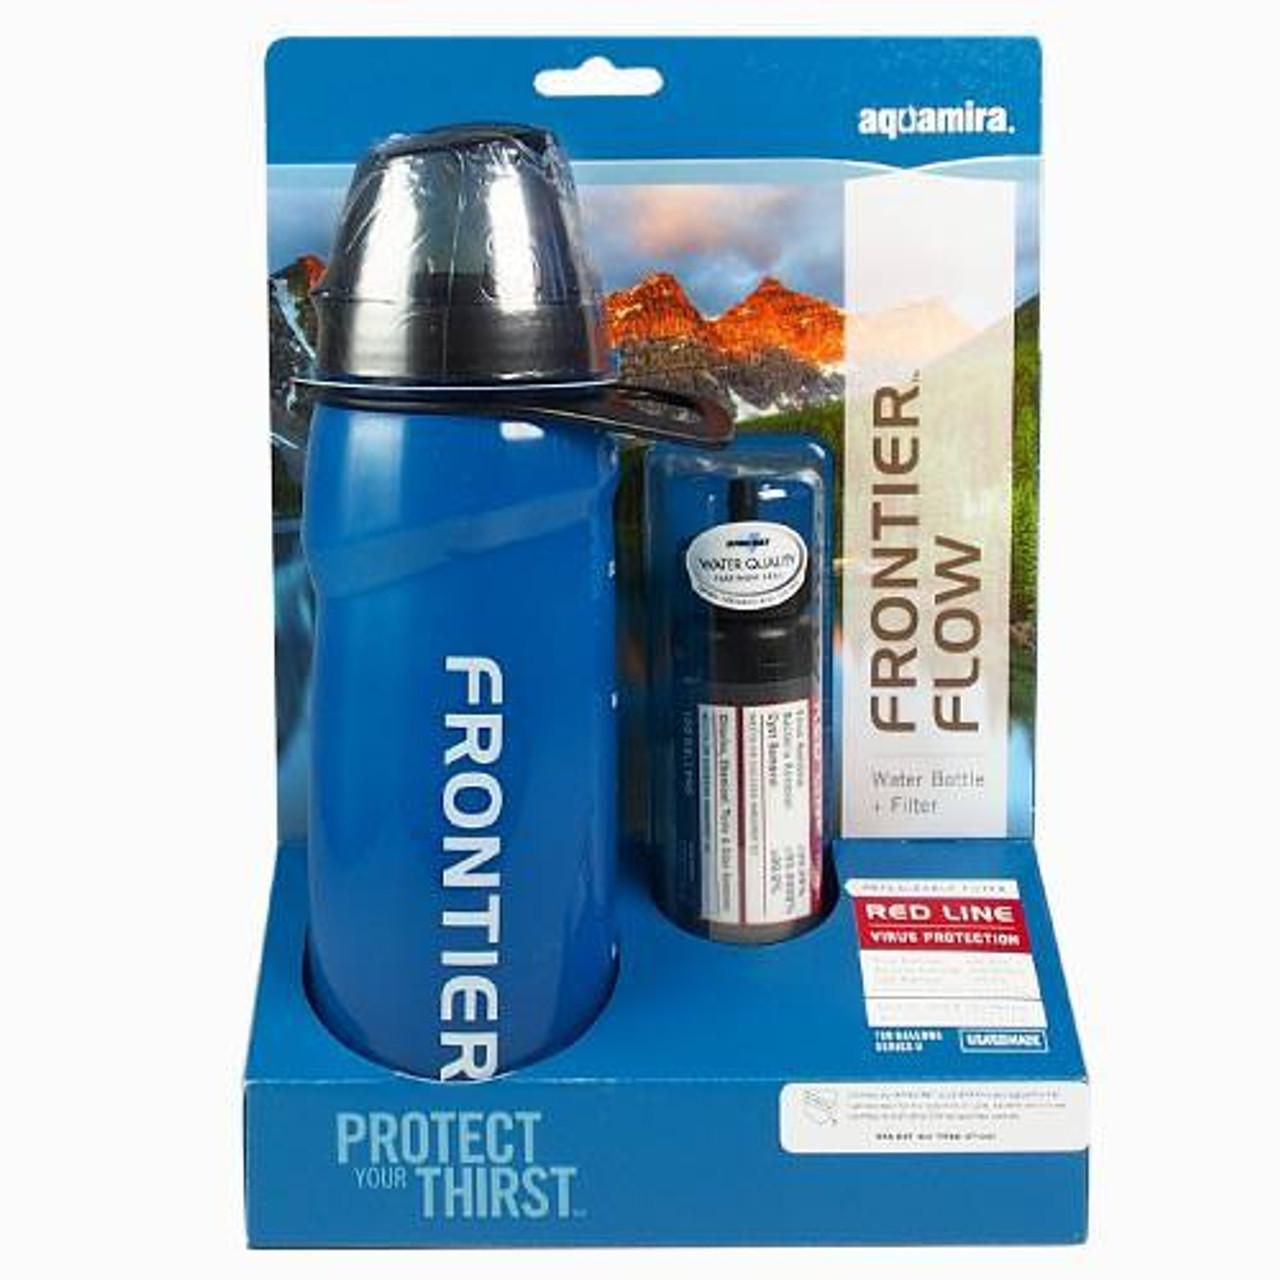 Frontier™ Flow Water Bottle Filter - Red Line